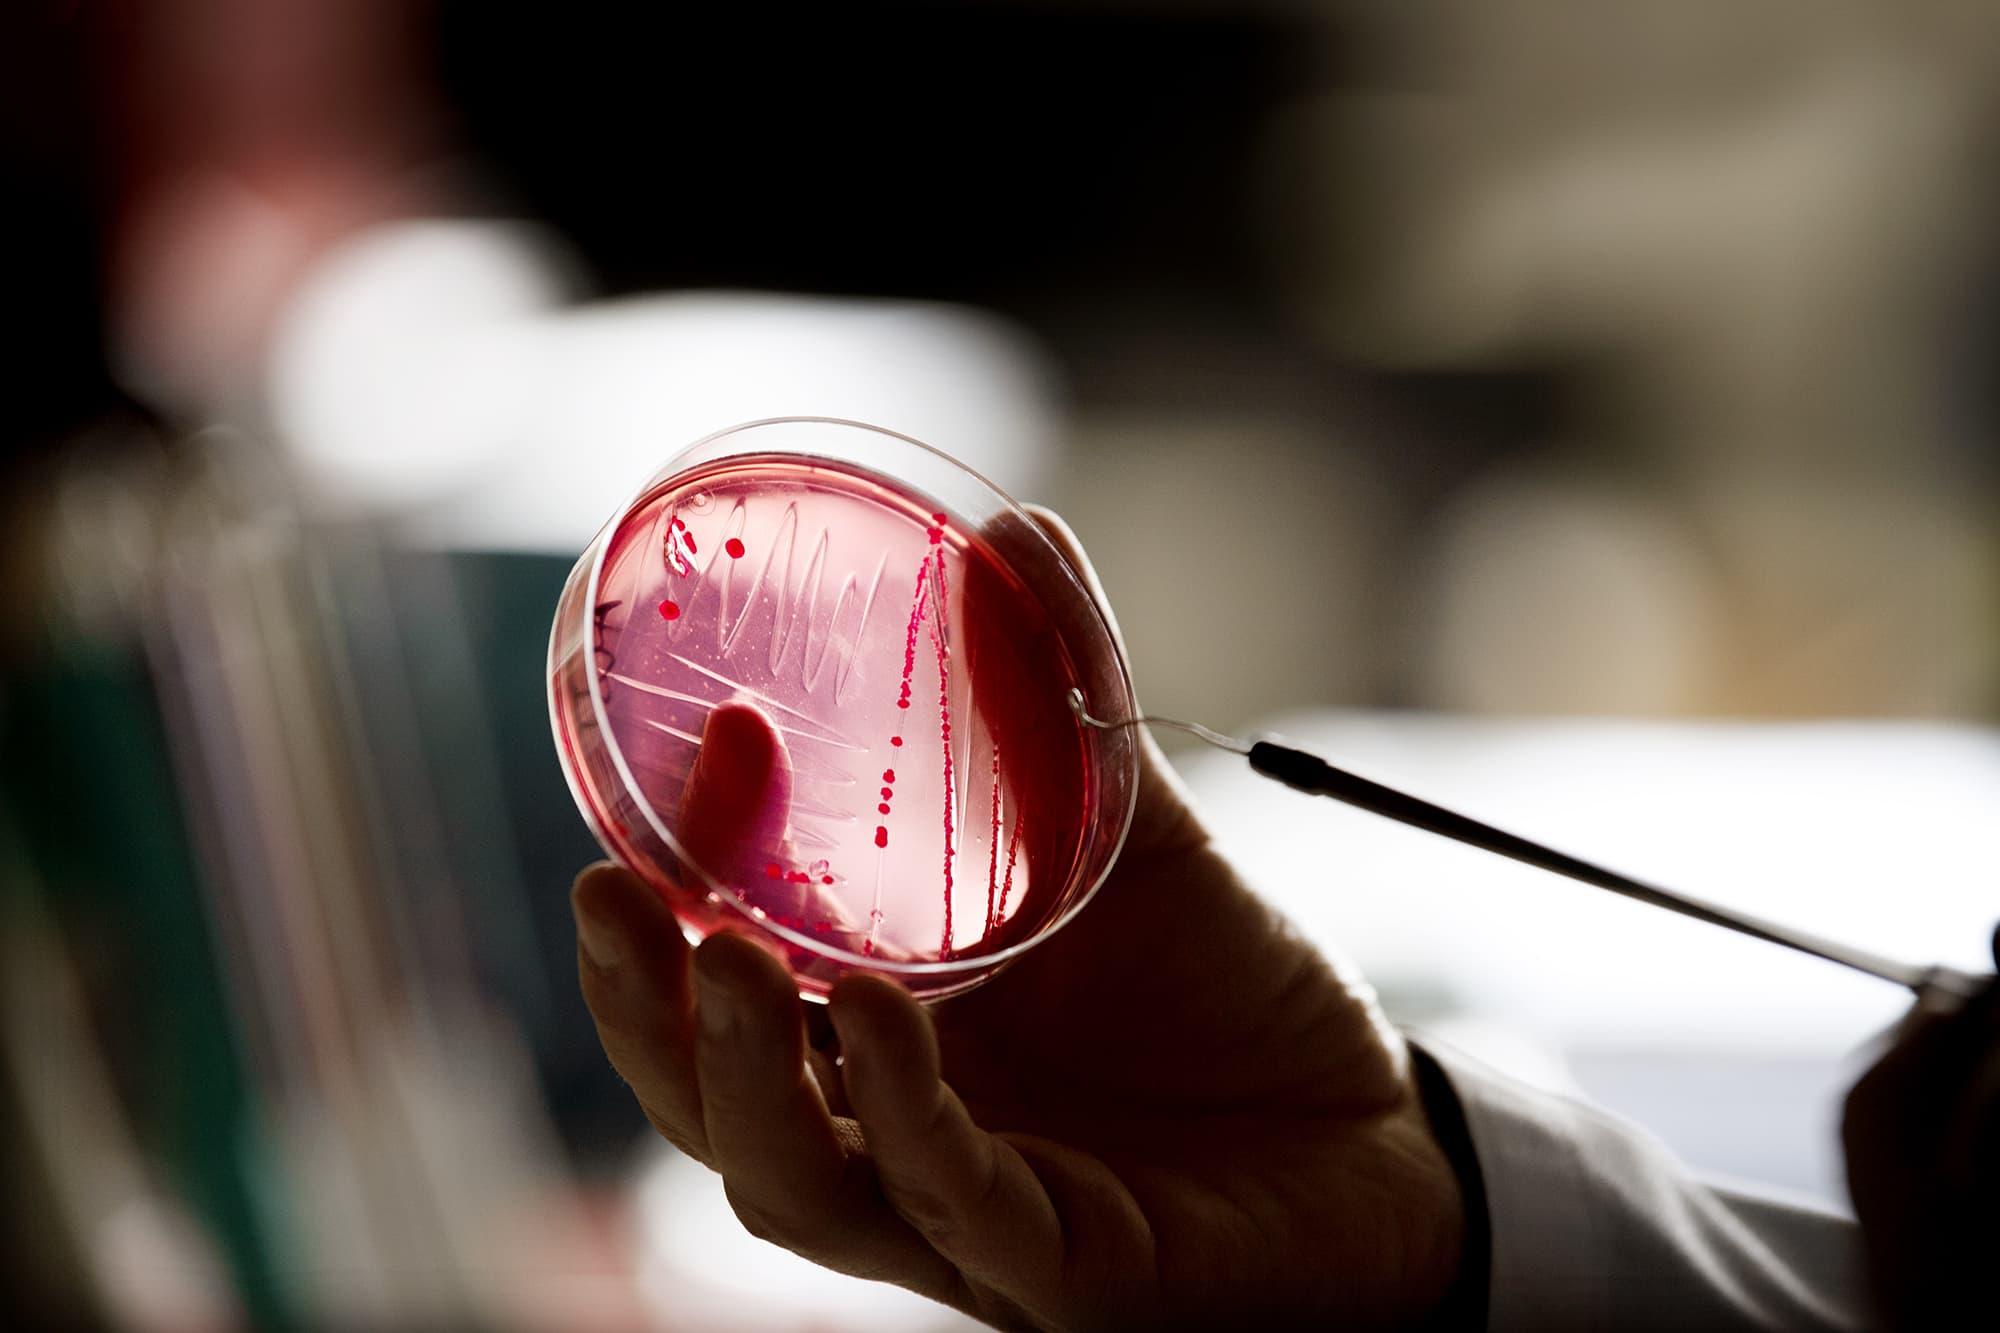 Bakteereja laboratorion viljelyastiassa.